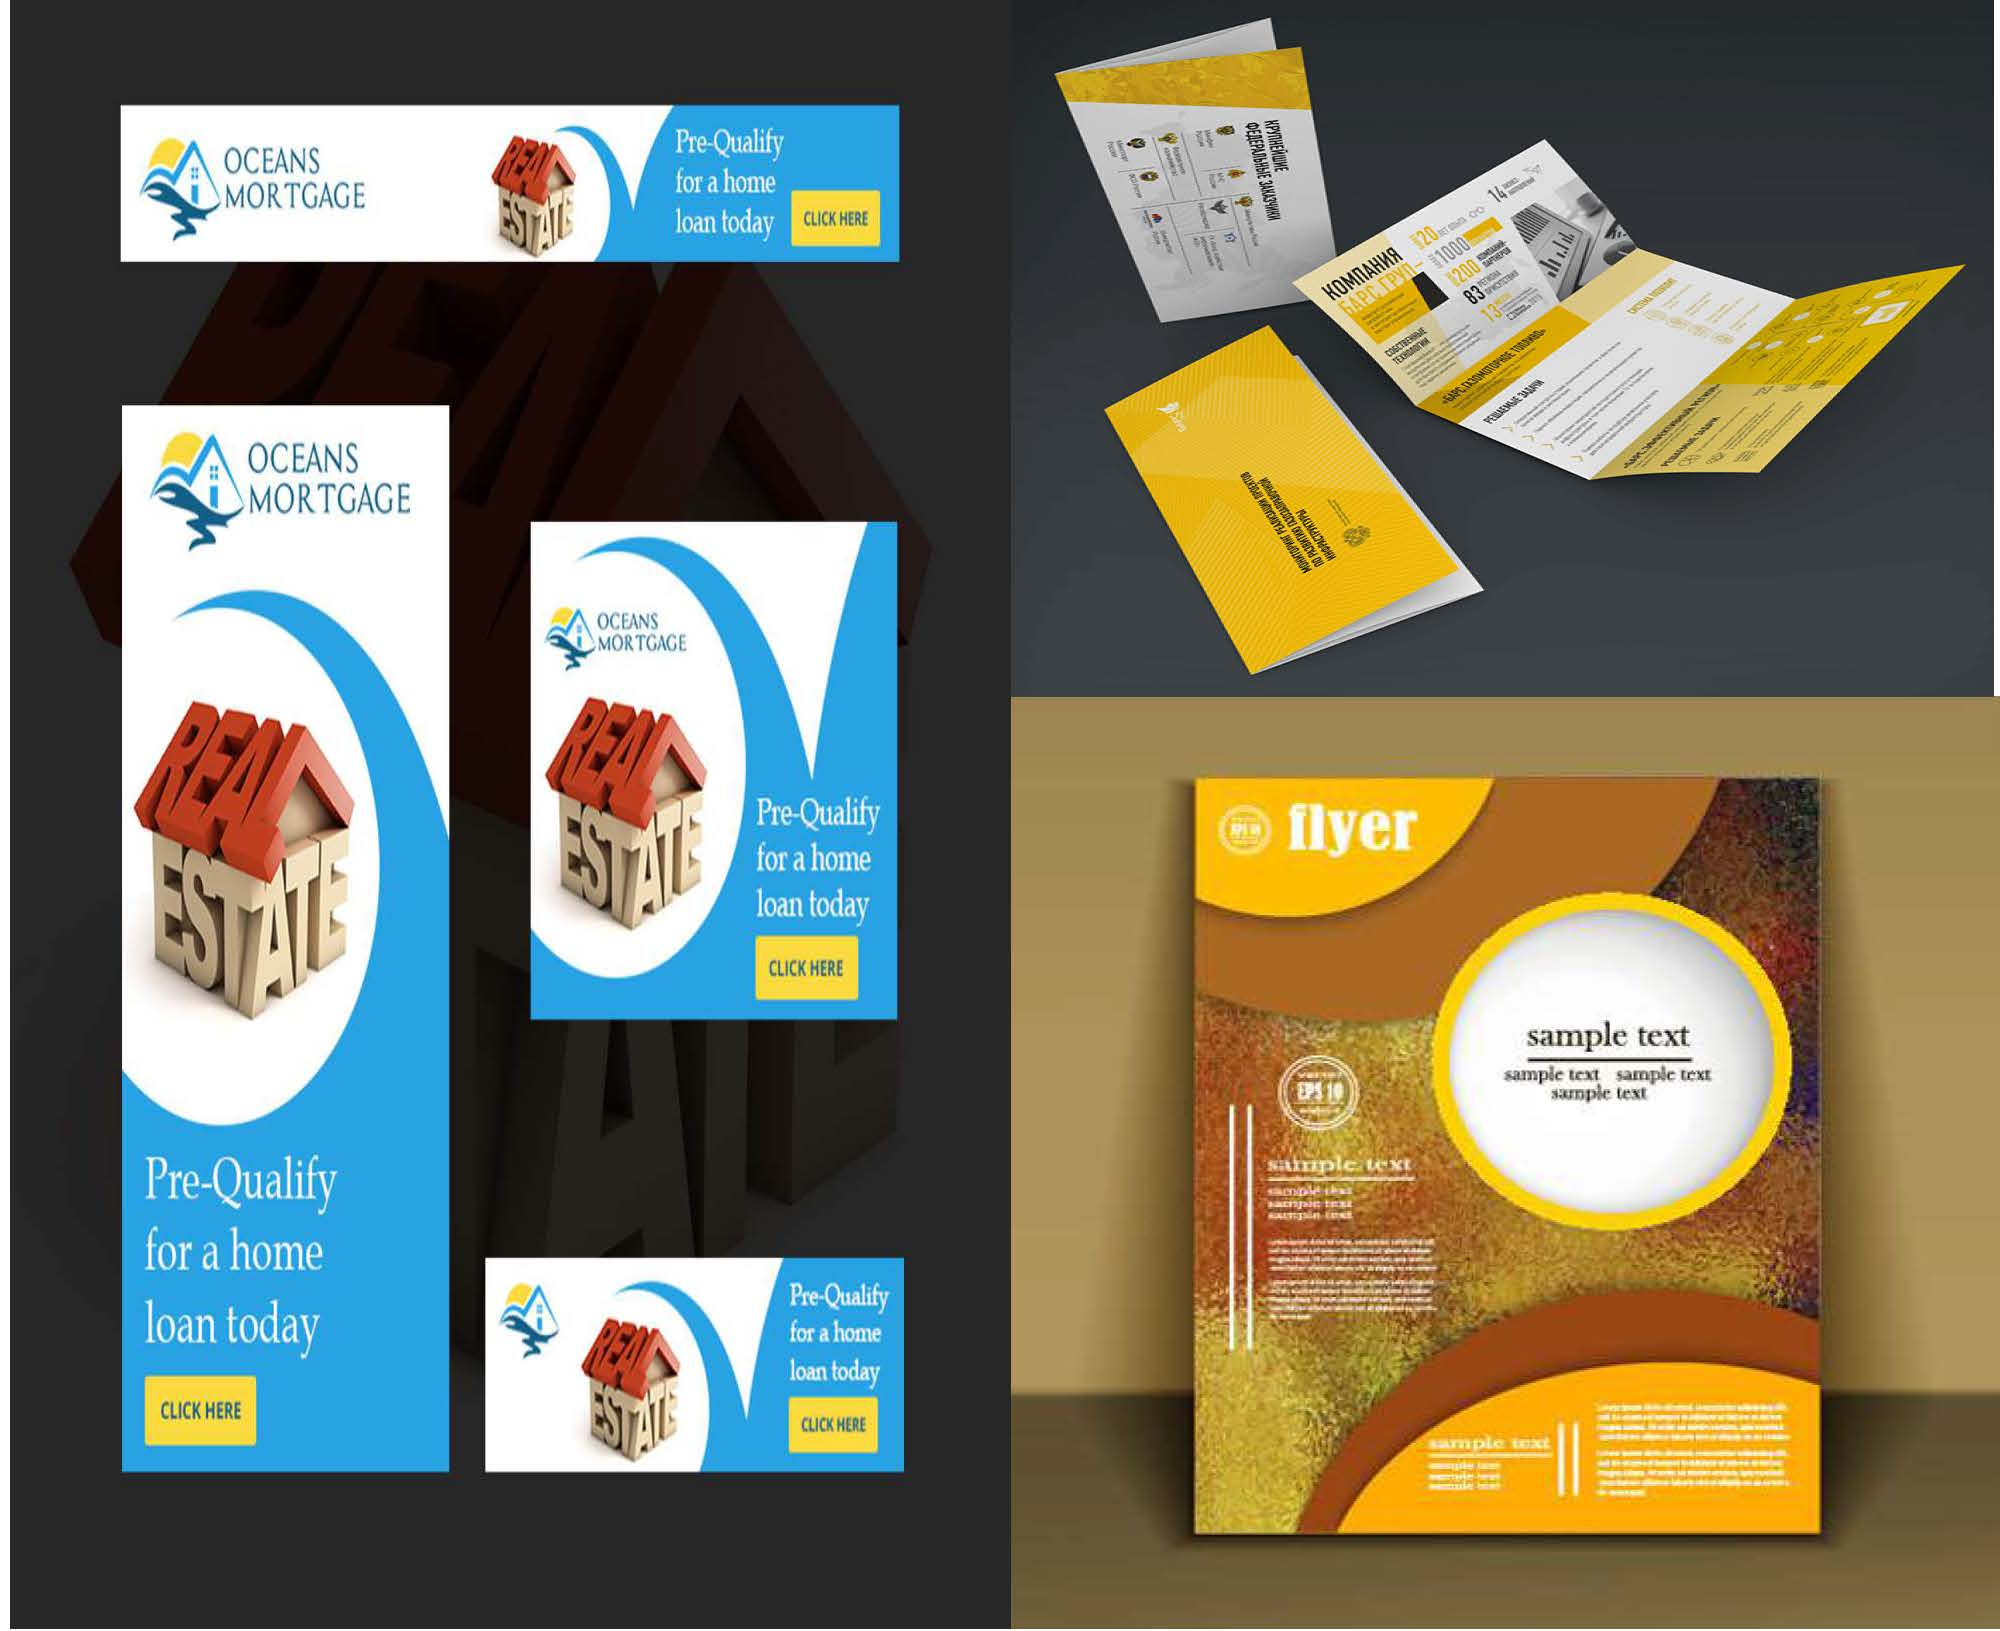 Design book cover, flyer